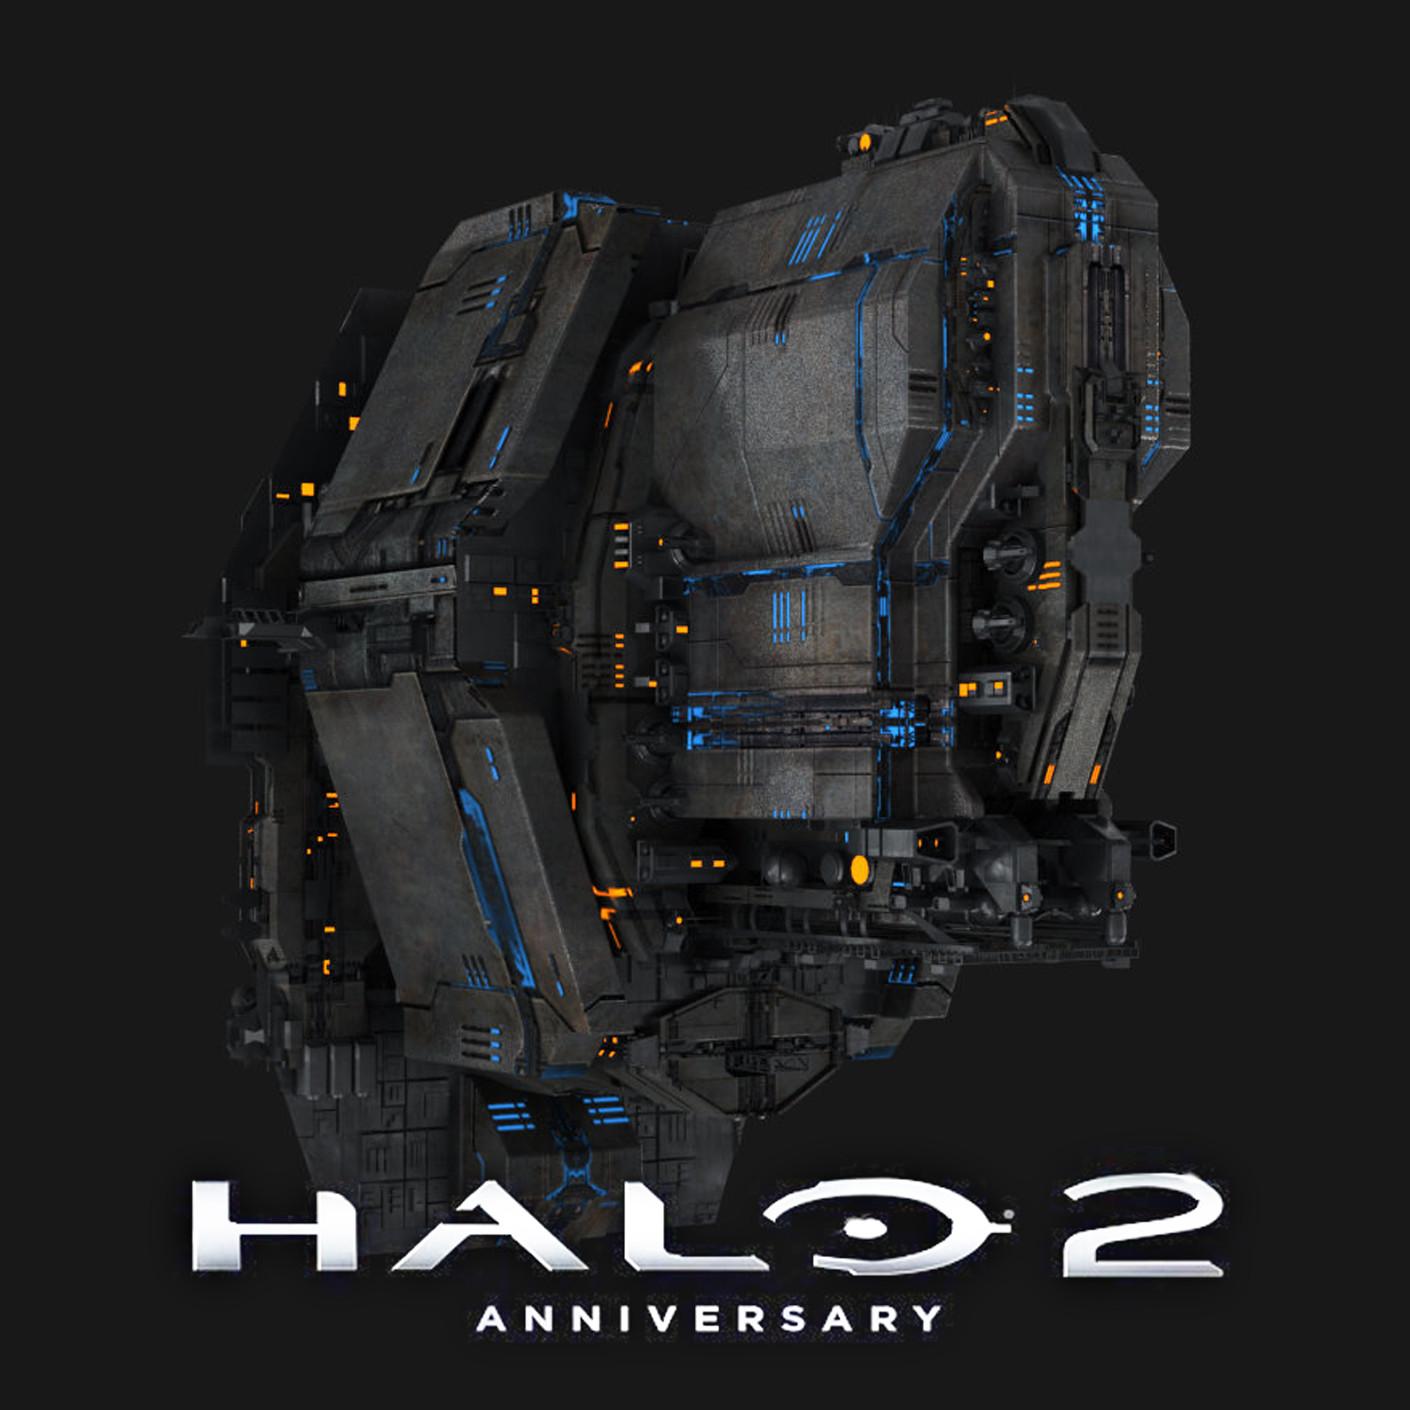 ArtStation - Halo 2 Anniversary: Spaceships, Andrew Averkin